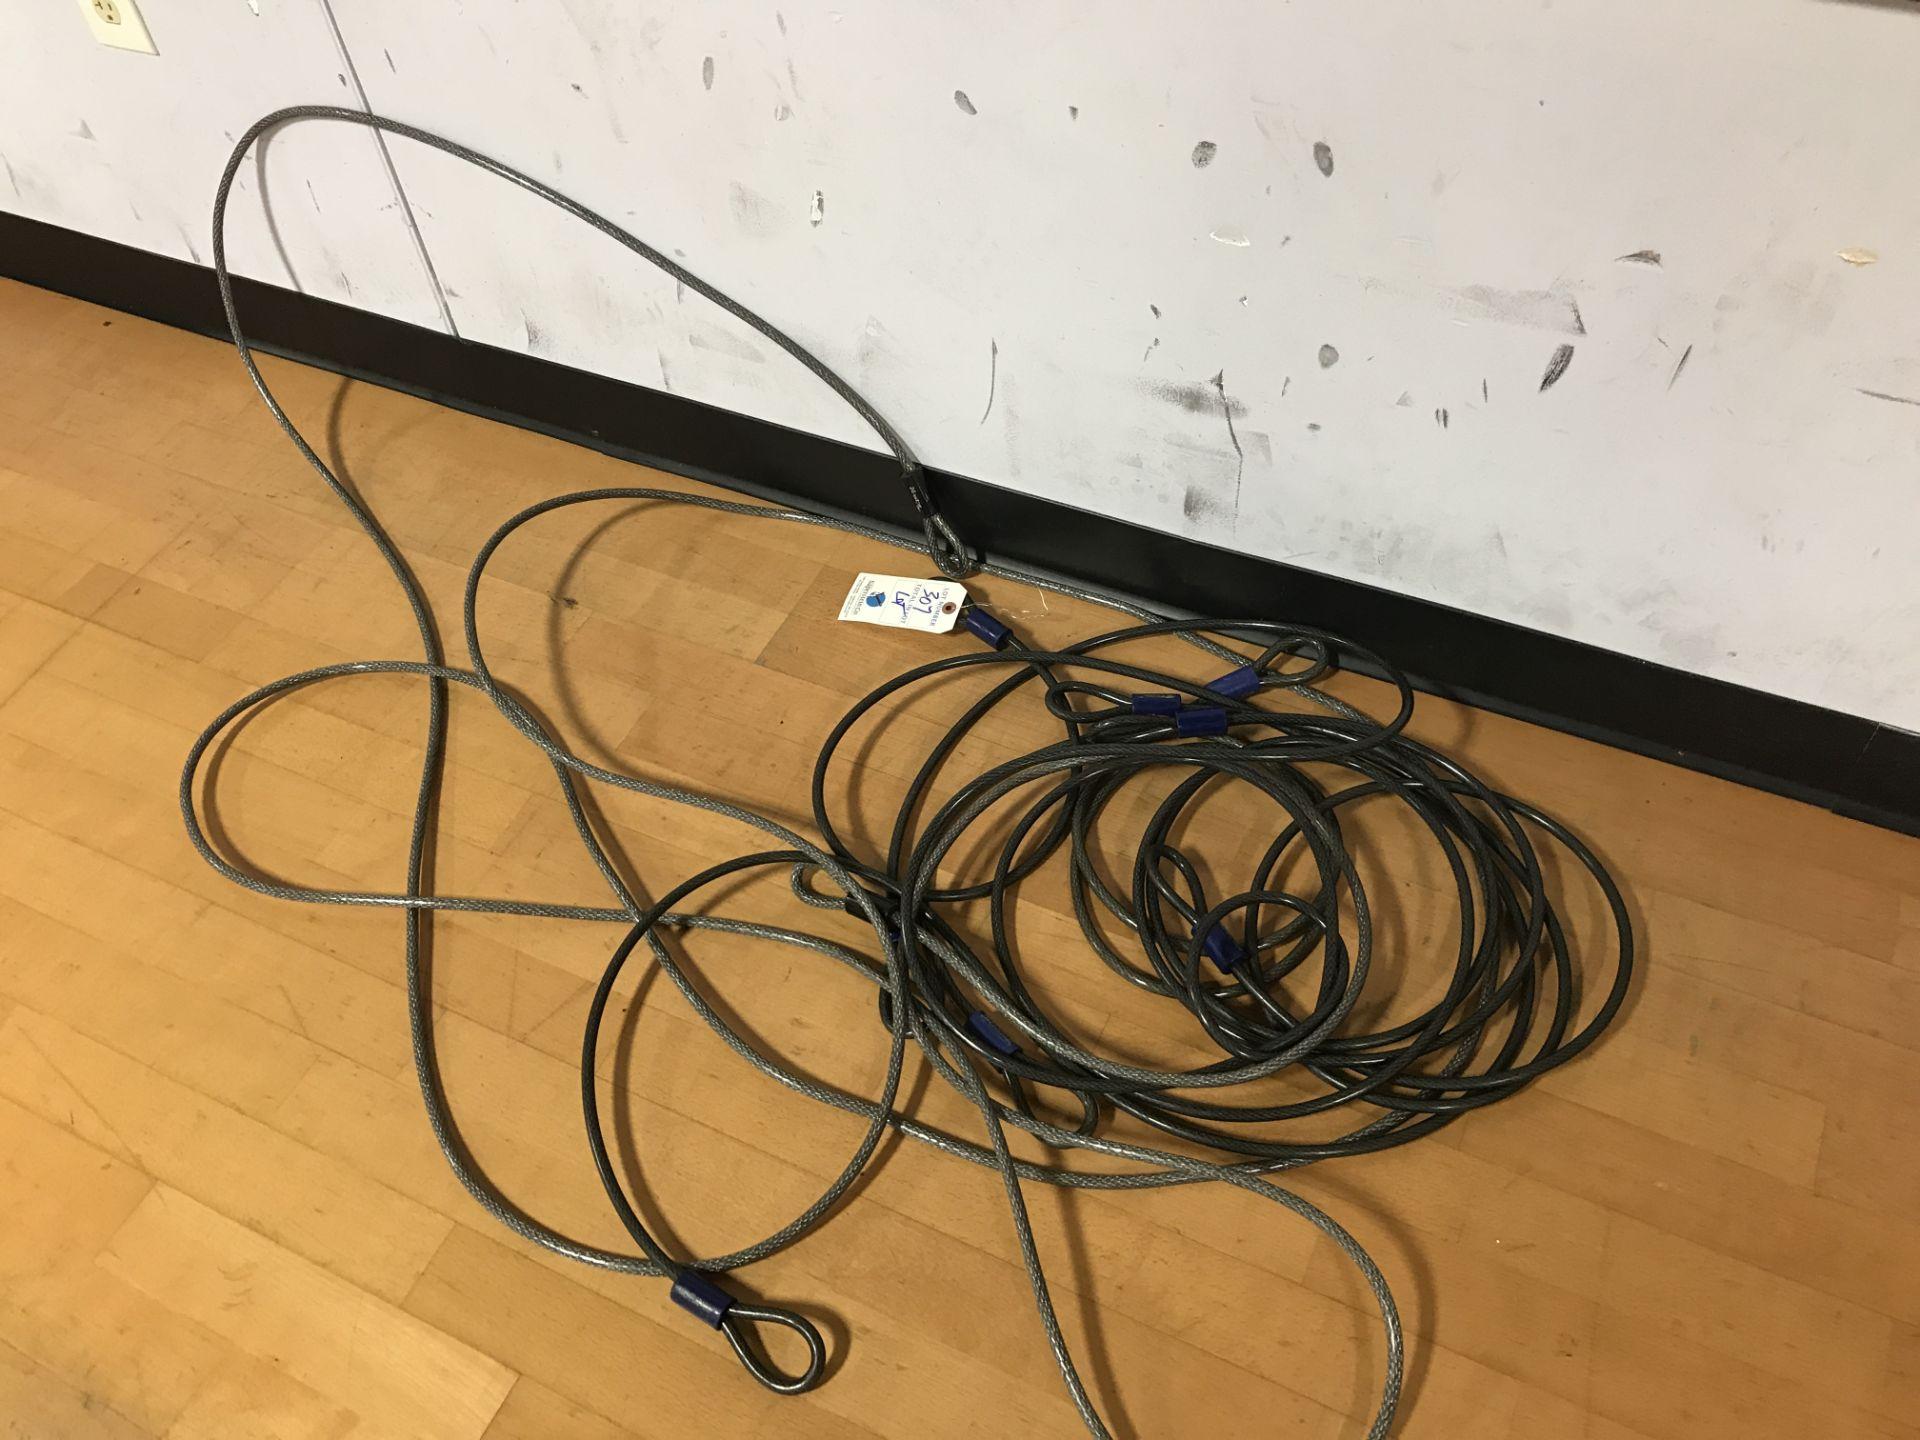 Lot 307 - {LOT} Asst. Schlage Cable